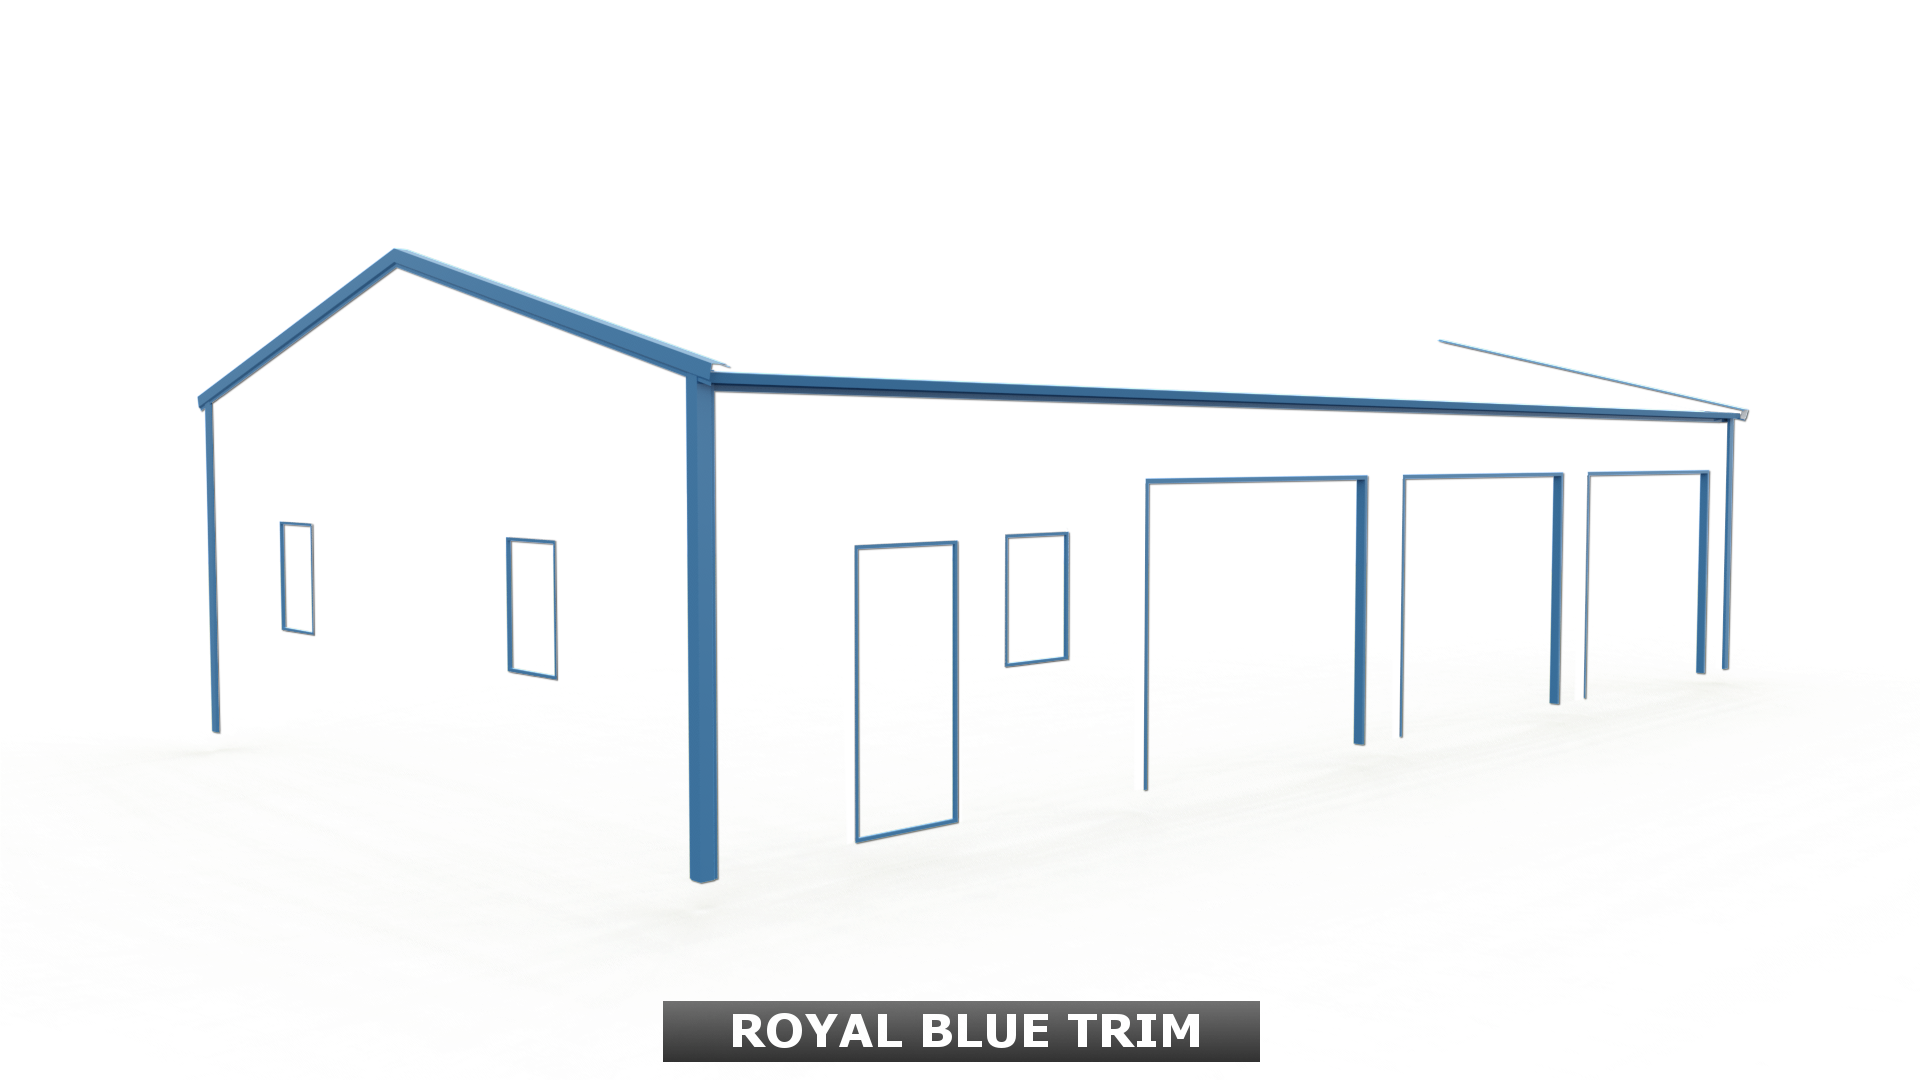 ROYAL BLUE TRIM